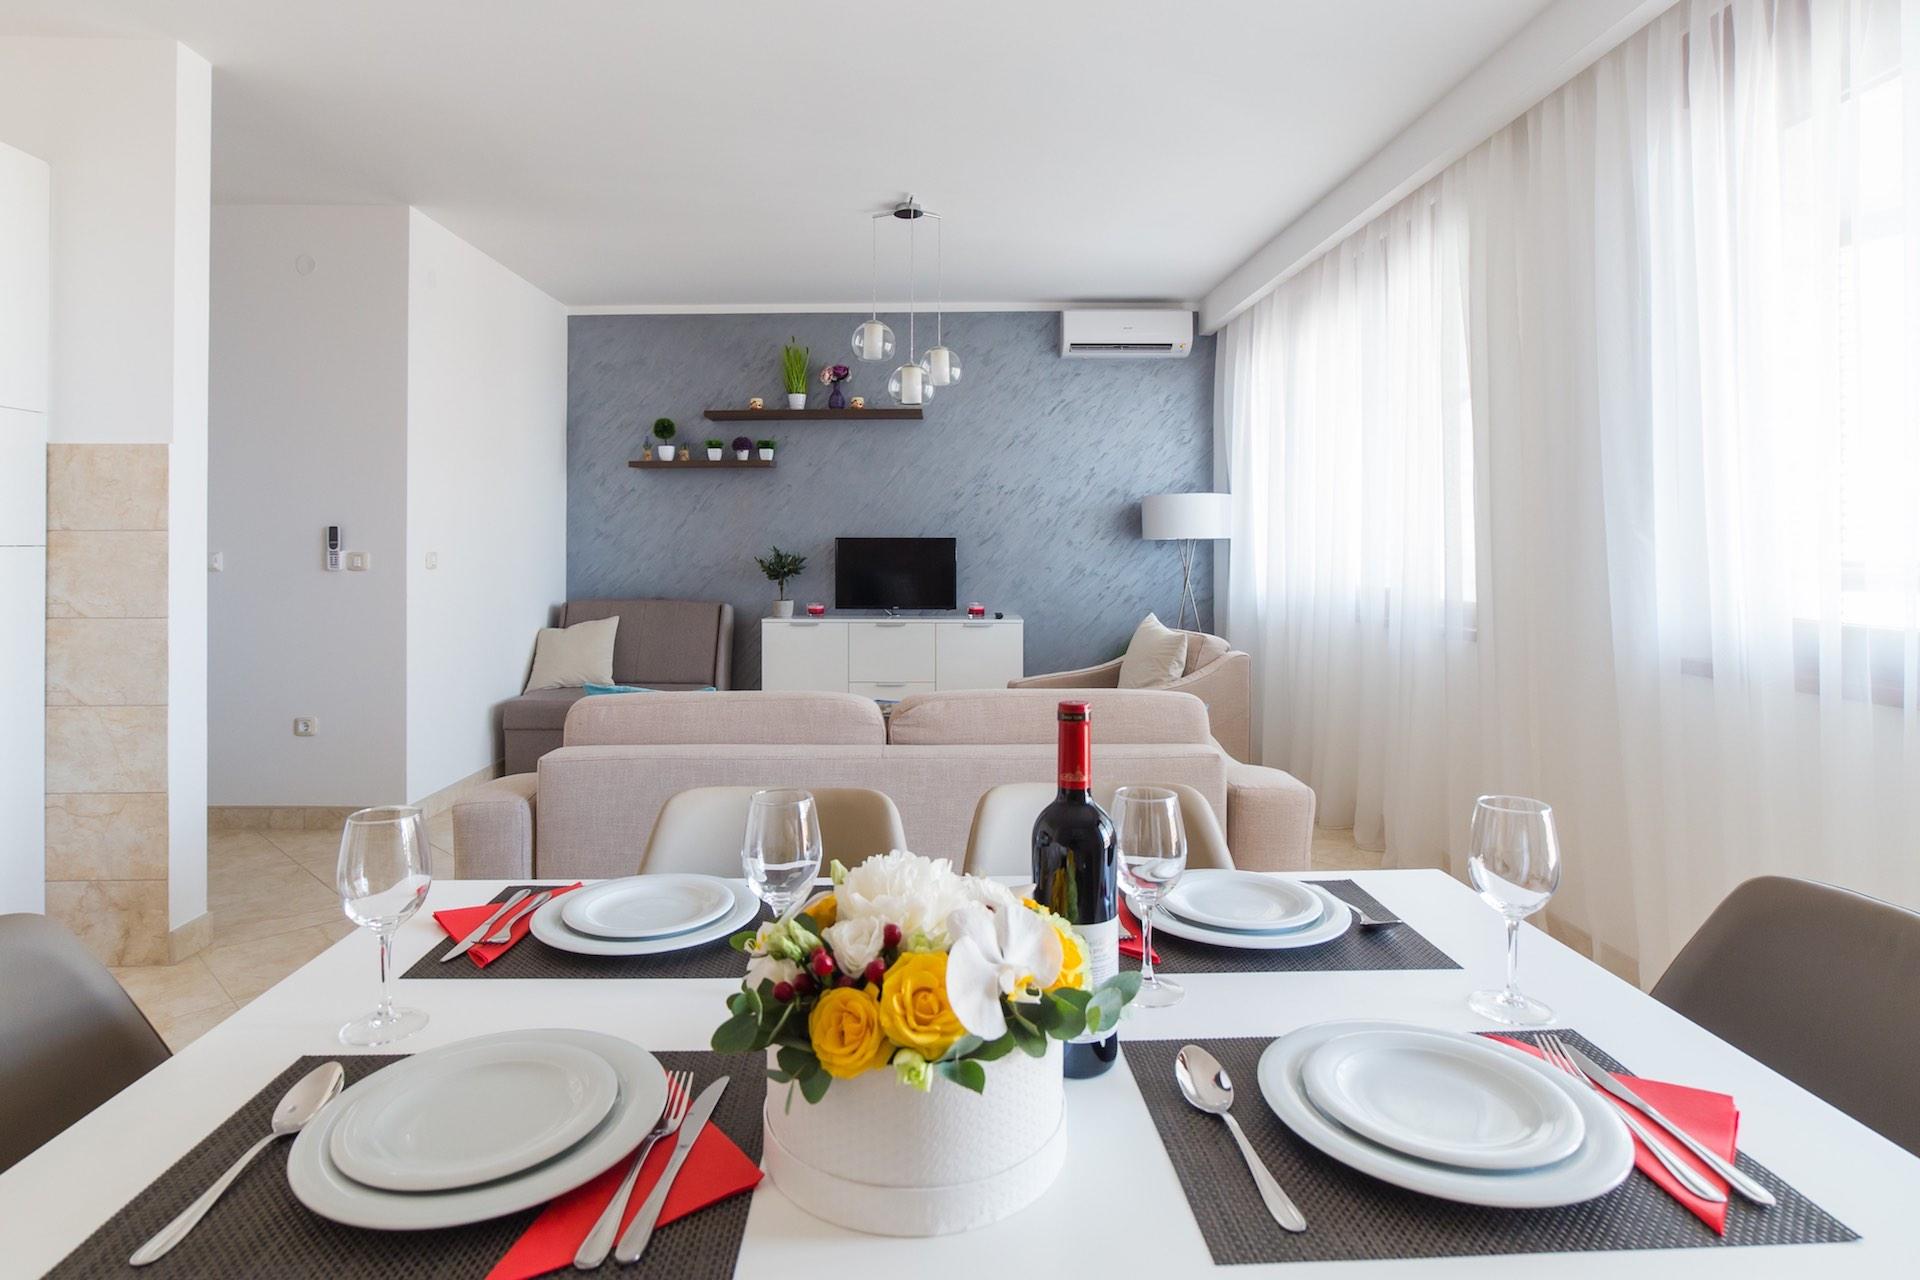 One Bedroom Apartments Aparthotel Anatolia Becici Budva Montenegro Best Hotel Book Now 16.jpg